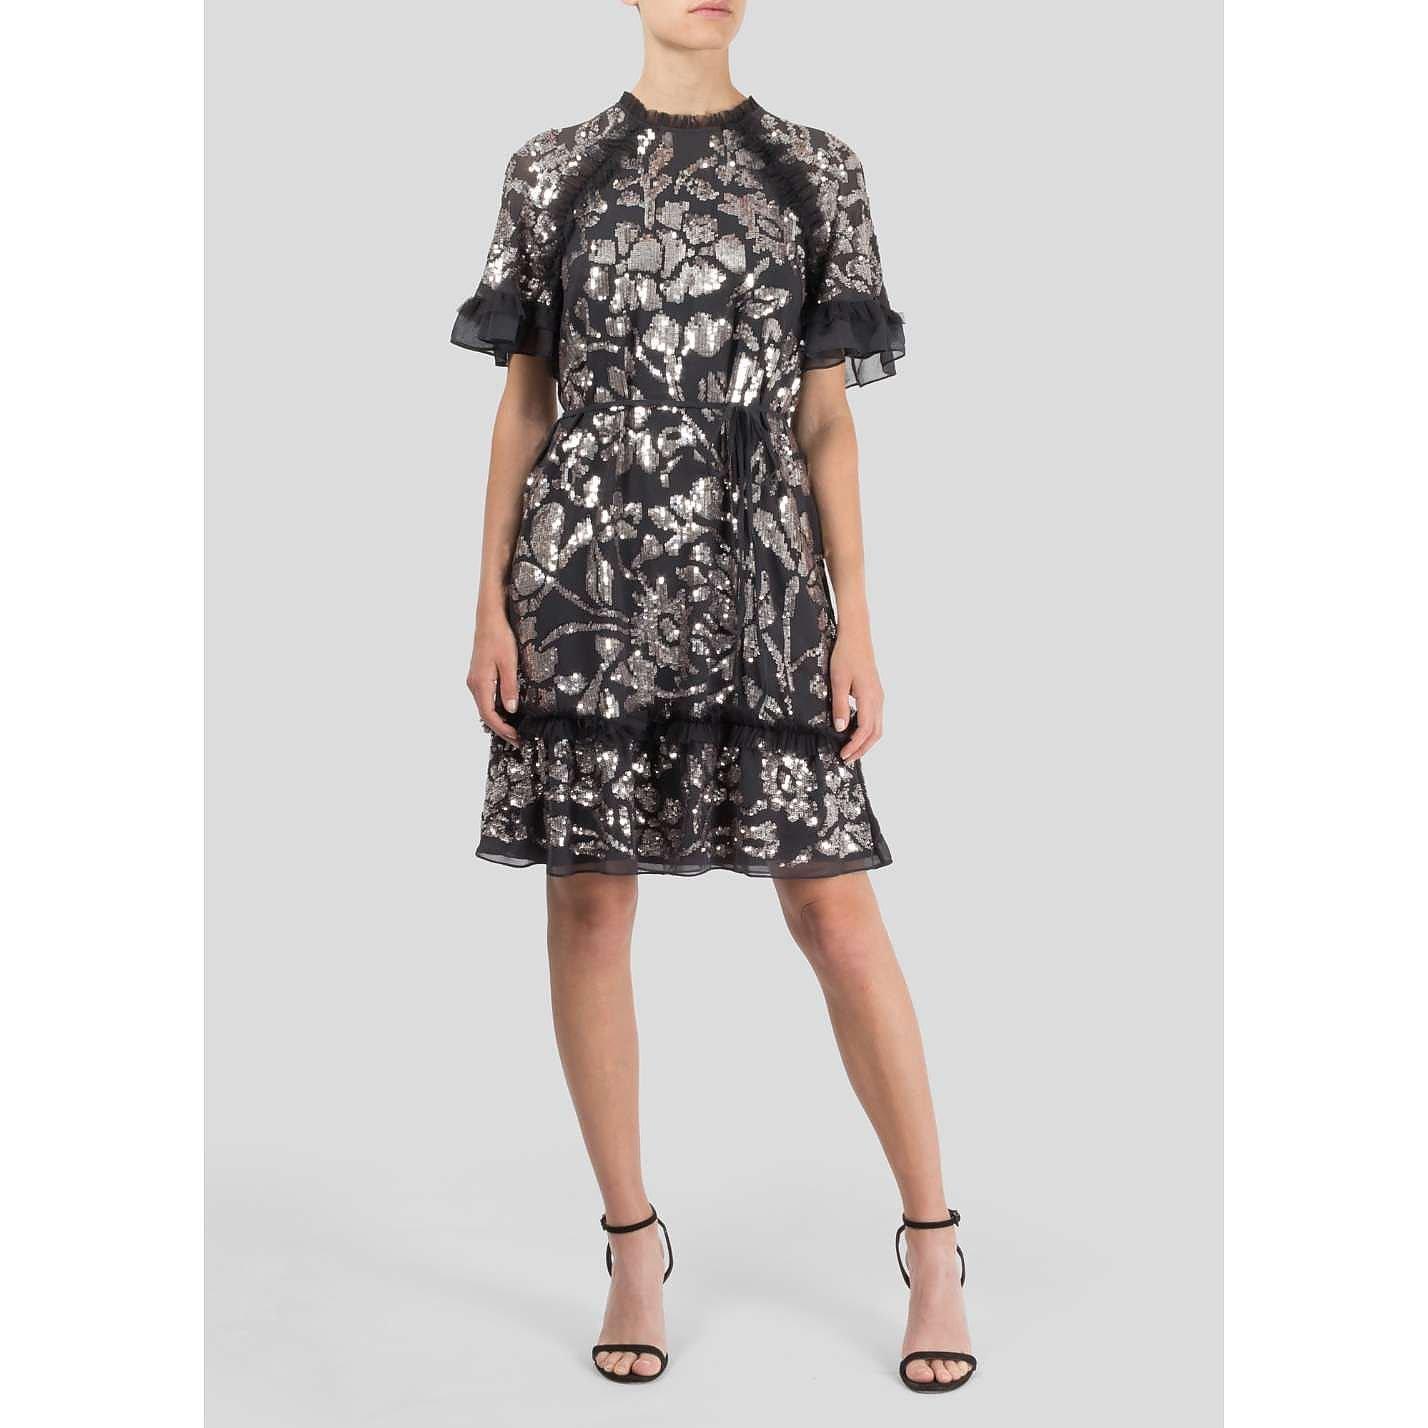 Needle & Thread Sequin Embellished Dress